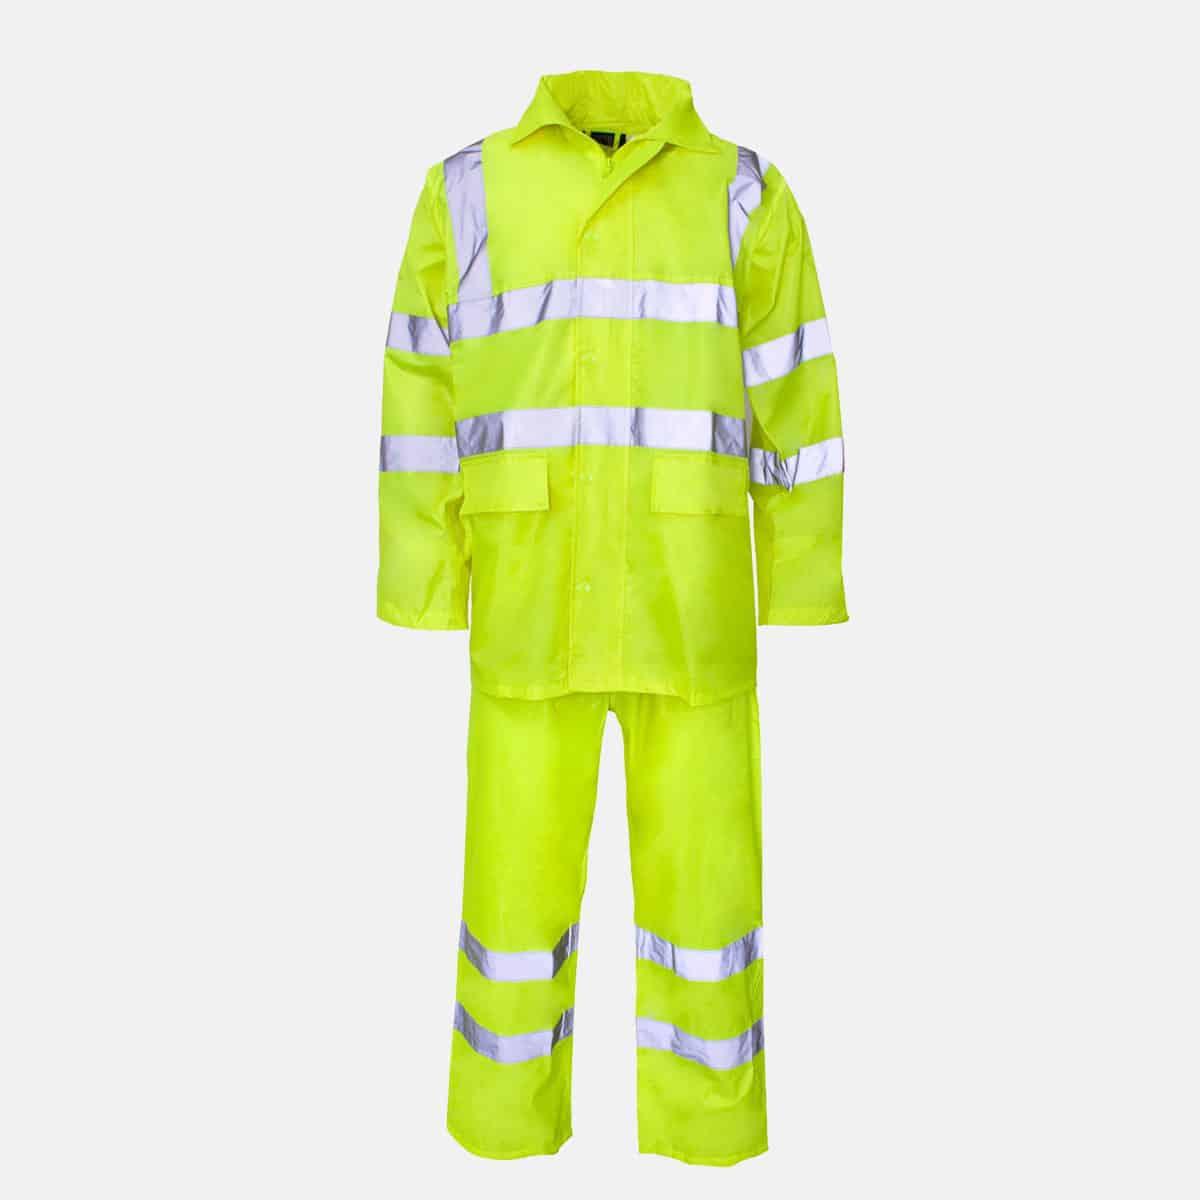 Polyester/PVC Hi Vis Yellow Rainsuit by Supertouch